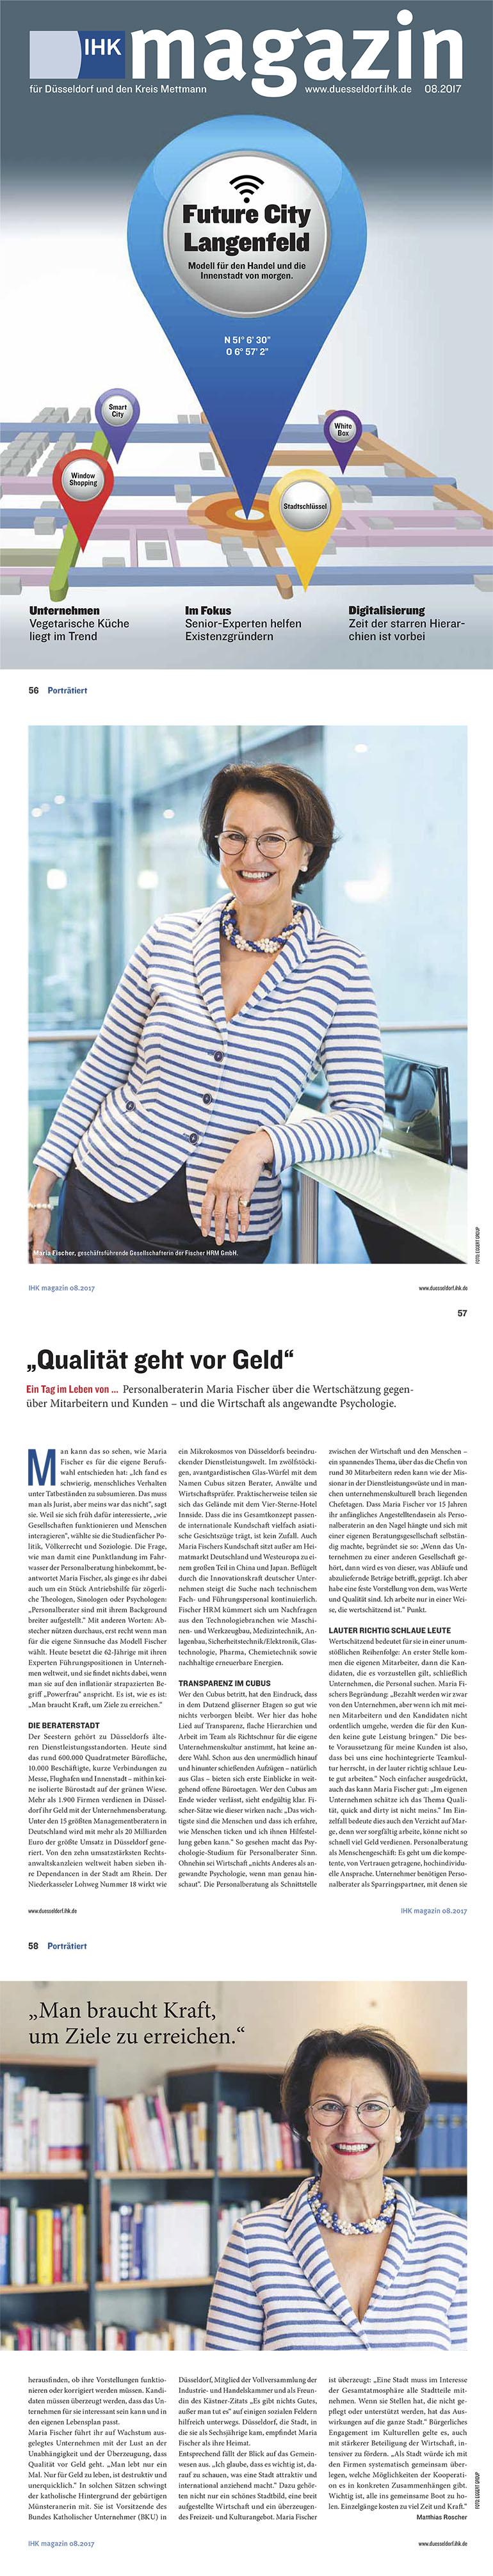 maria_fischer_news